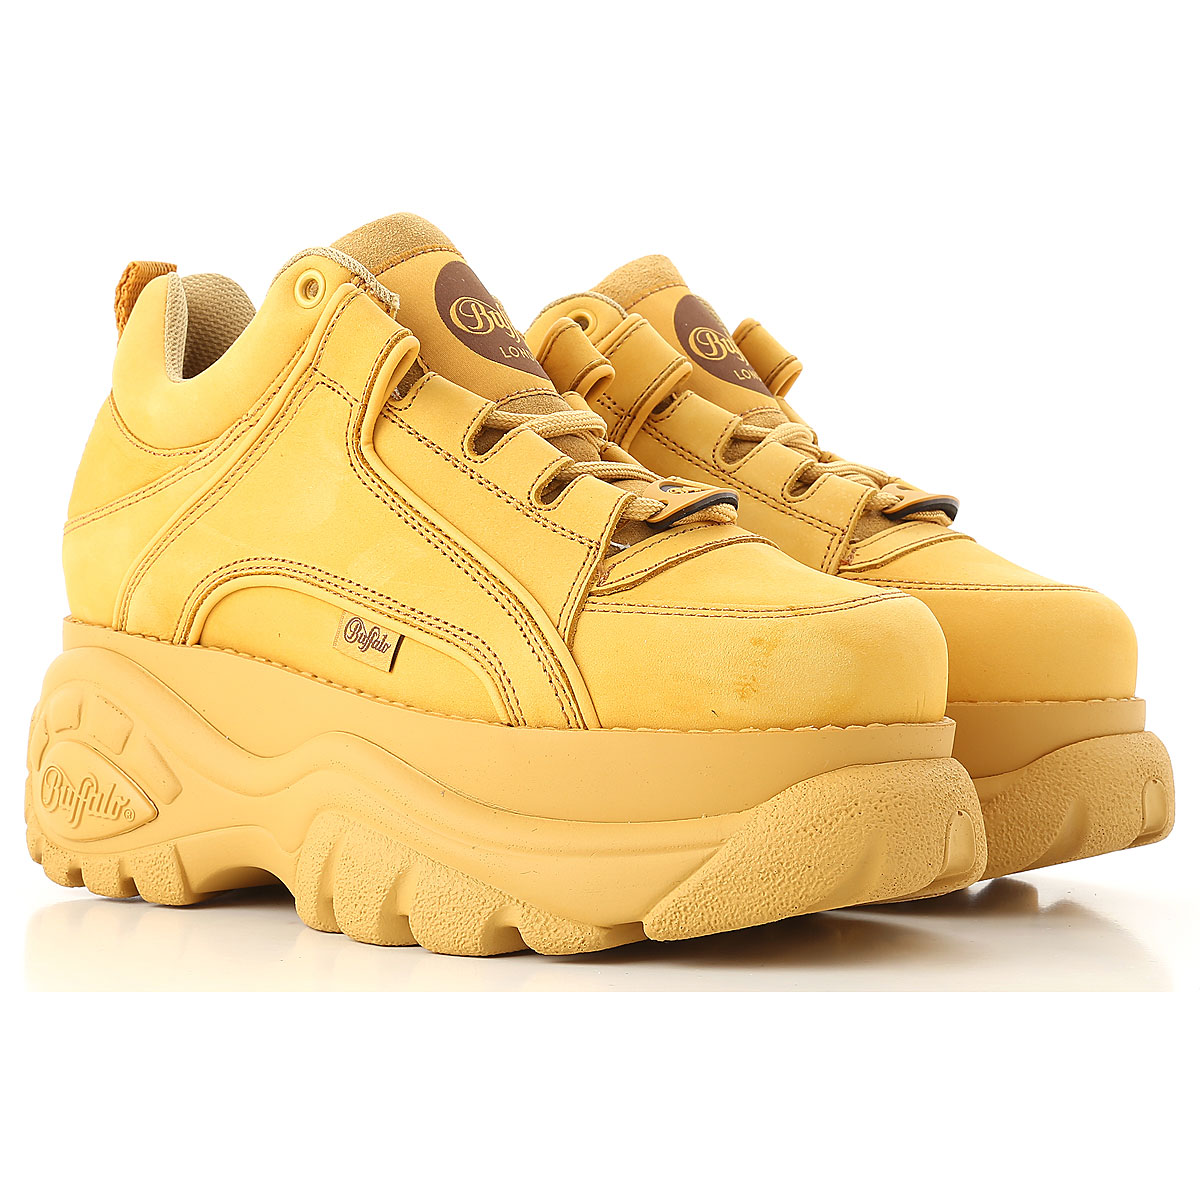 Buffalo Sneakers for Women On Sale in Outlet, Desert, Leather, 2019, UK 5.5 - EU 39 - US 8.5 UK 6 - EU 40 - US 9